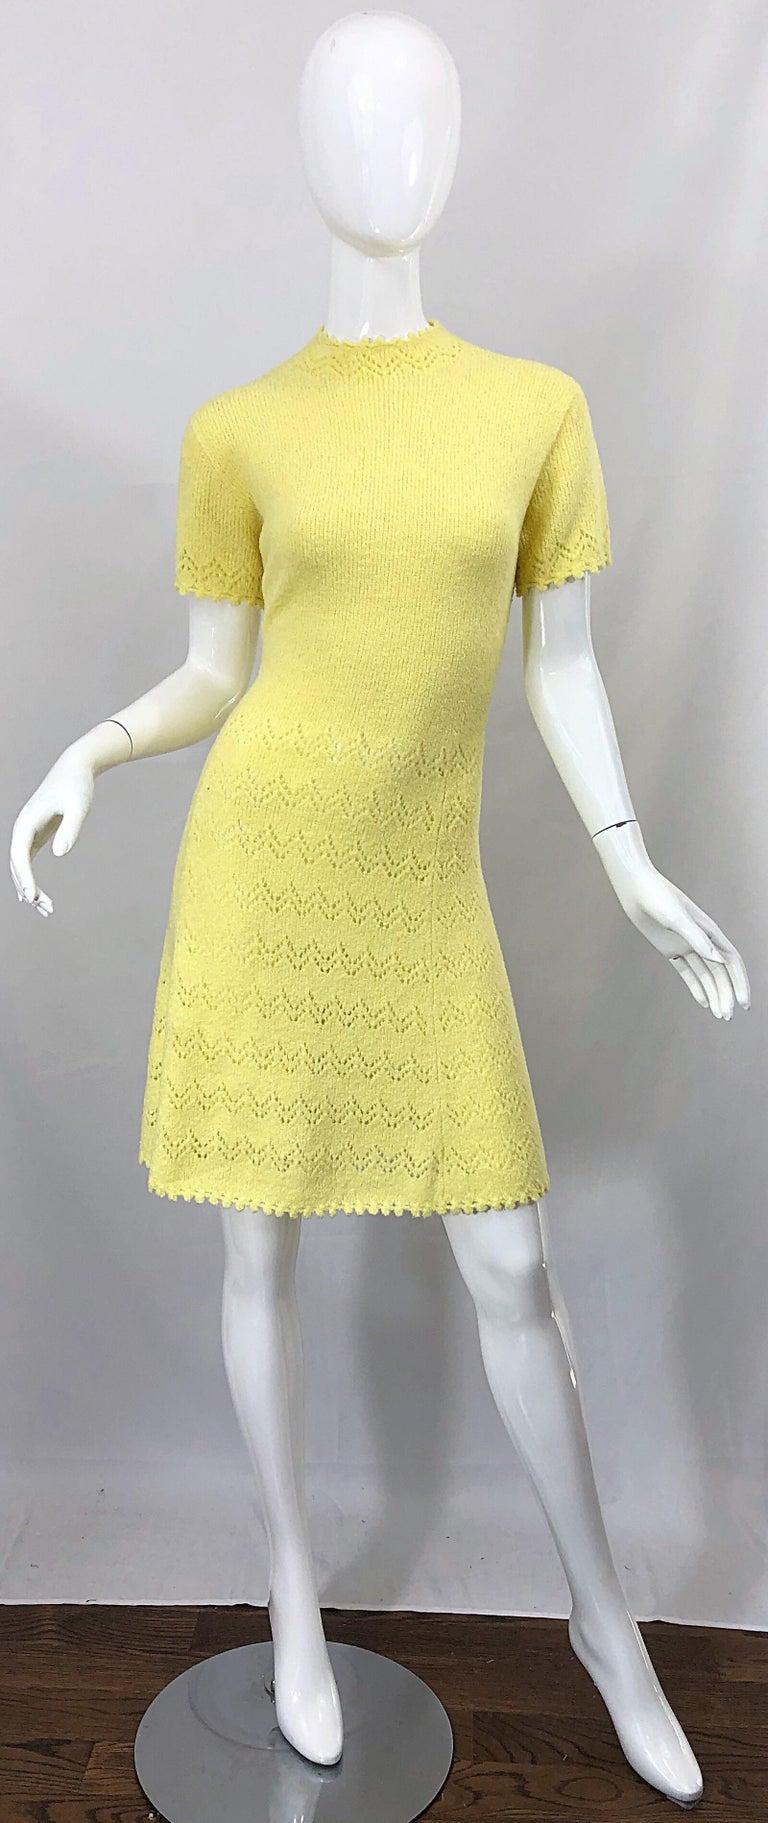 1960s St John Canary Yellow Santana Knit Mod Crochet Vintage A Line 60s Dress For Sale 9